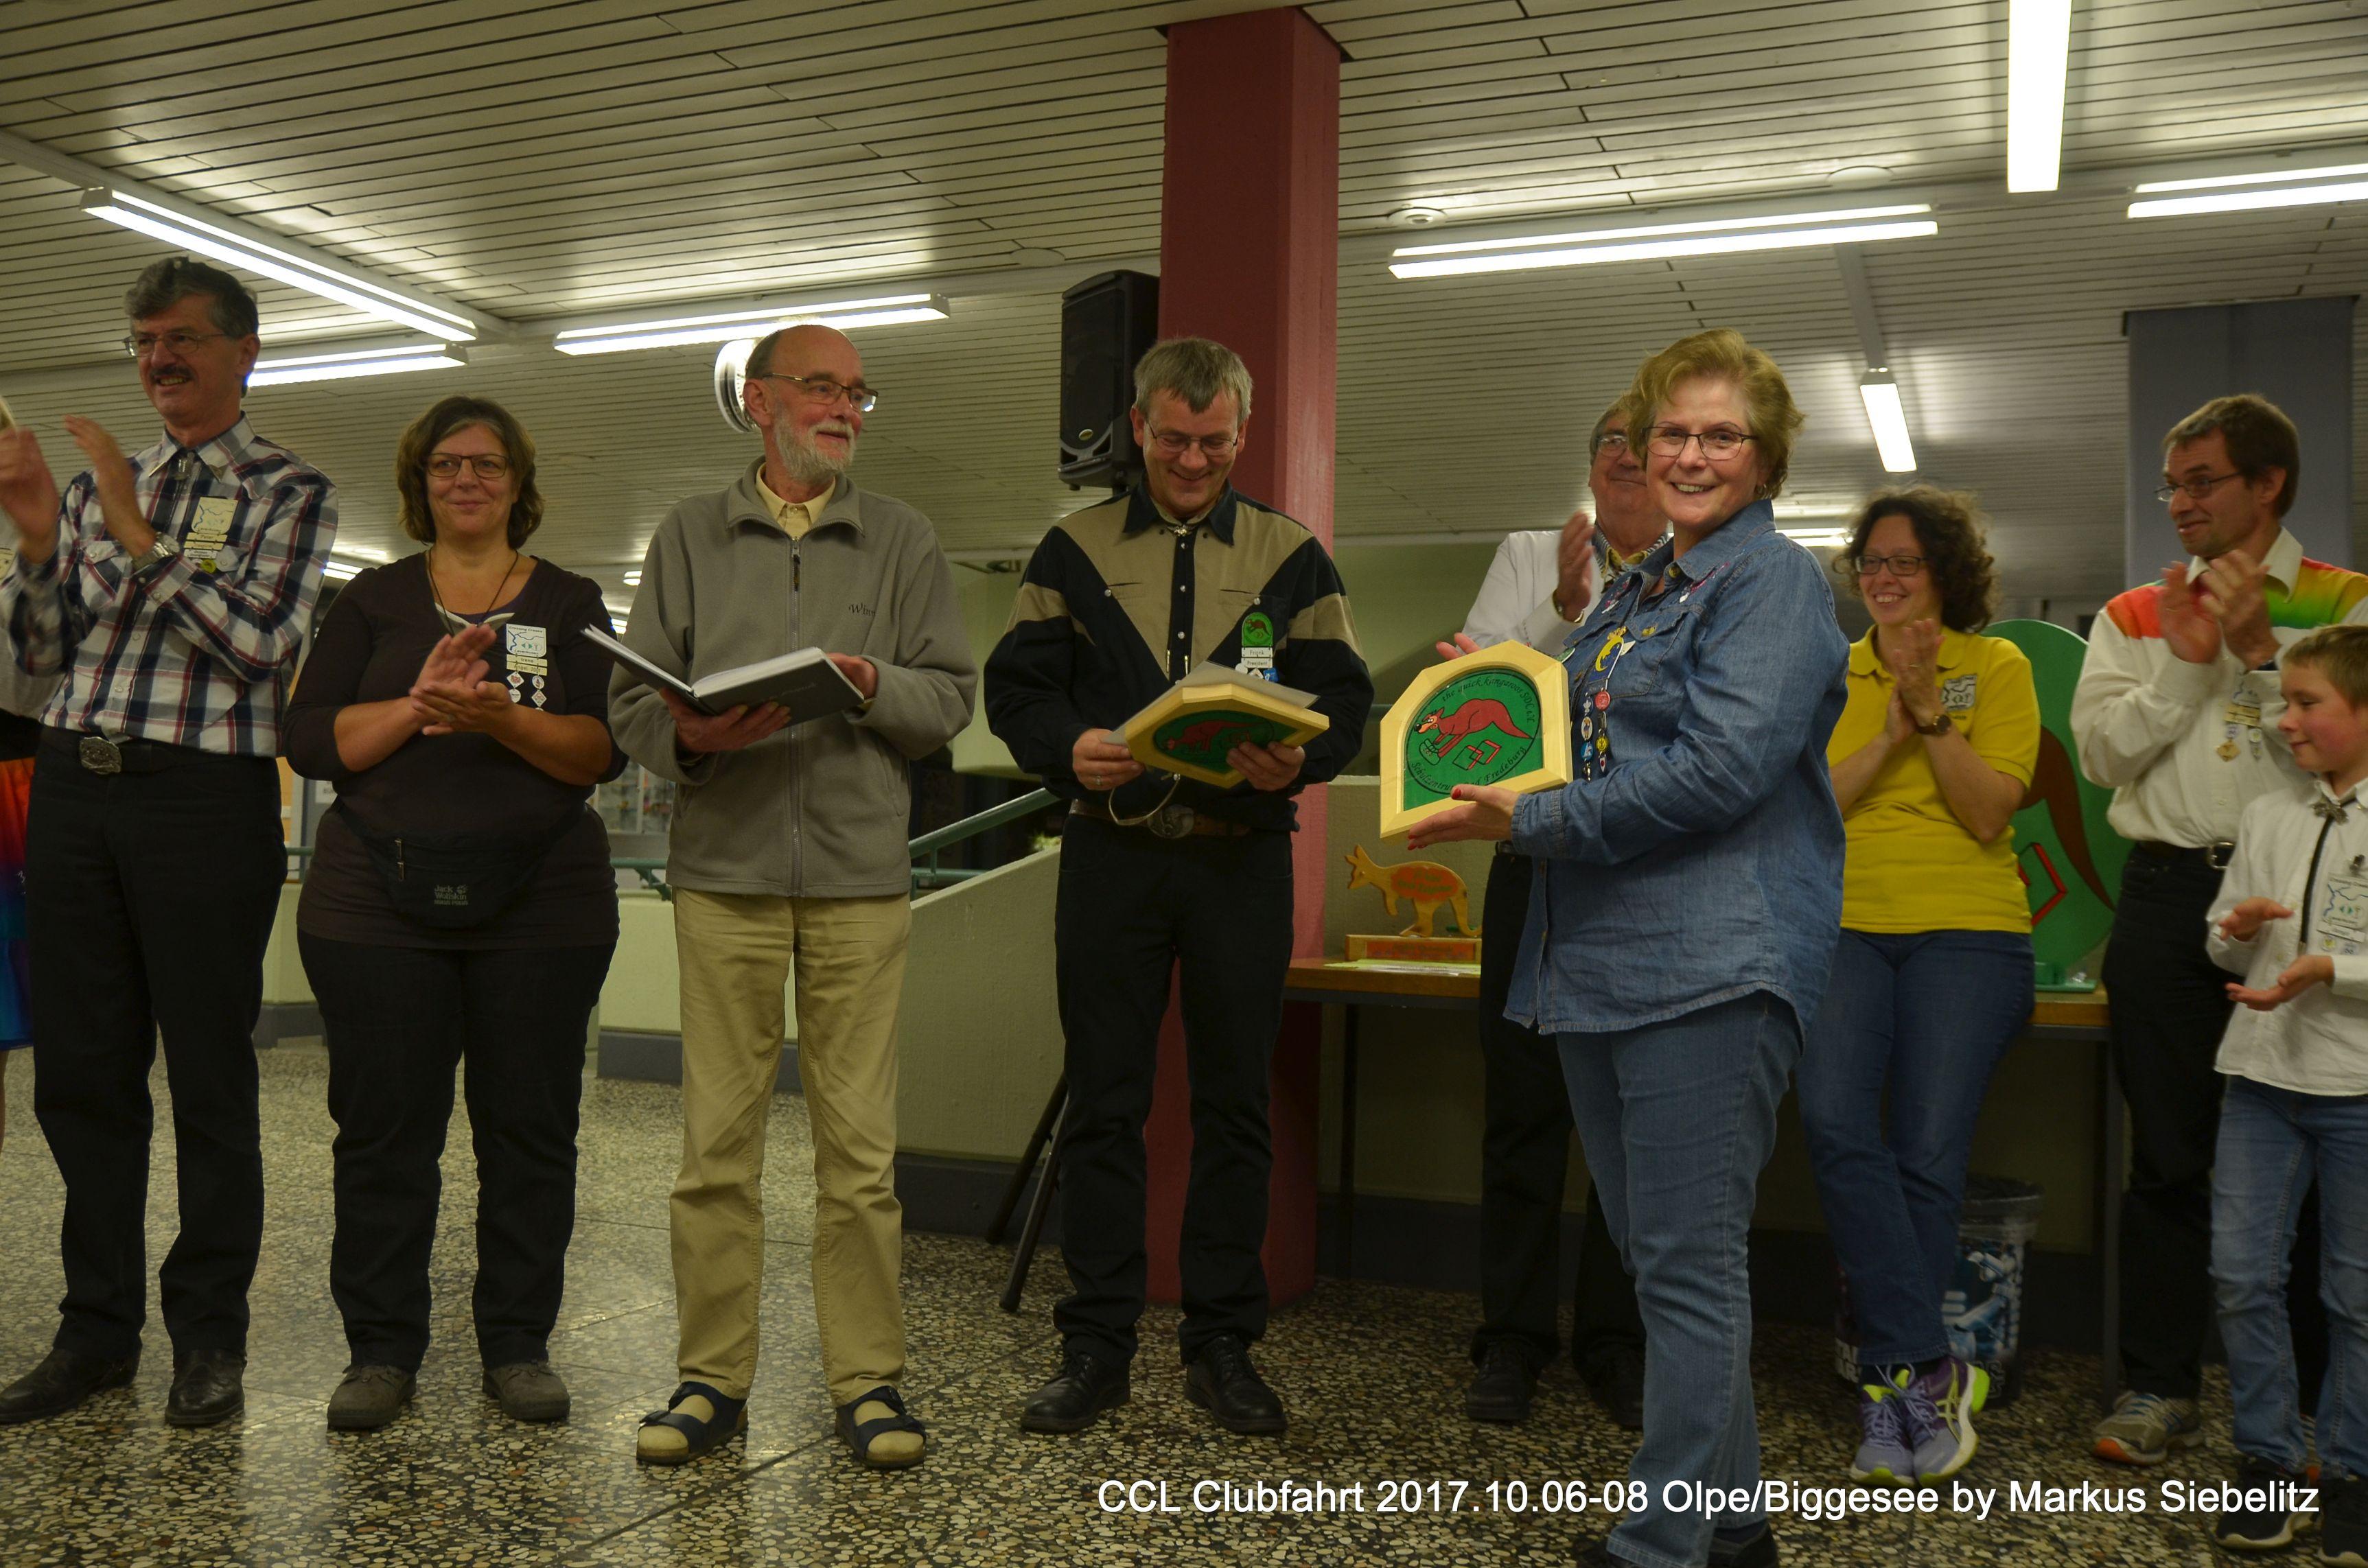 CCL Clubfahrt 2017.10.06-08 Biggesee (79)